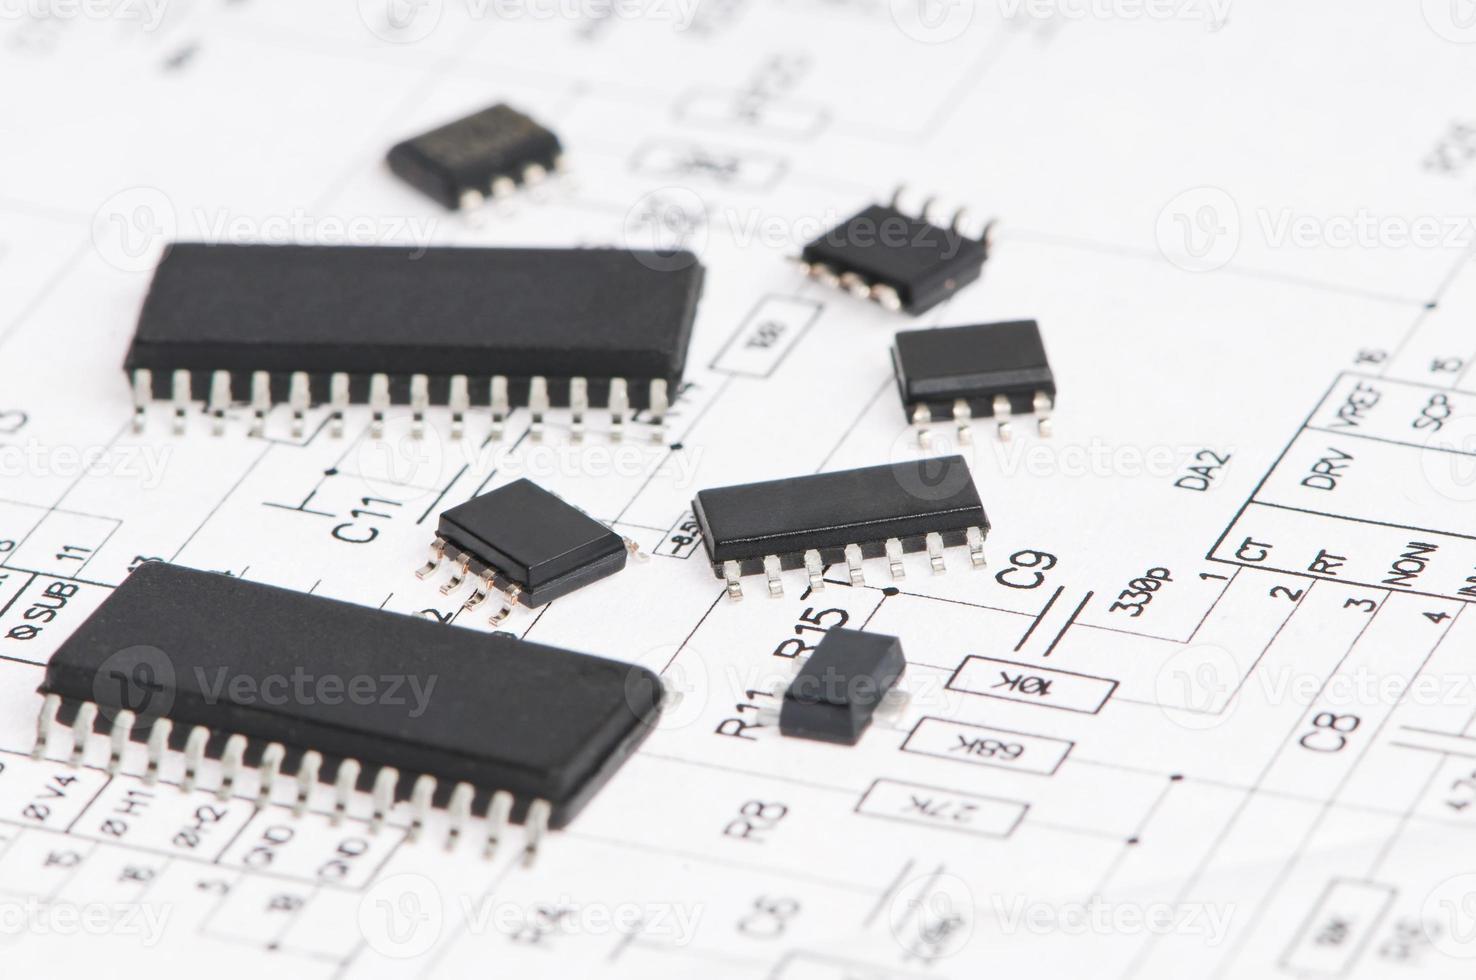 Mikroelektronikelement und Layout foto